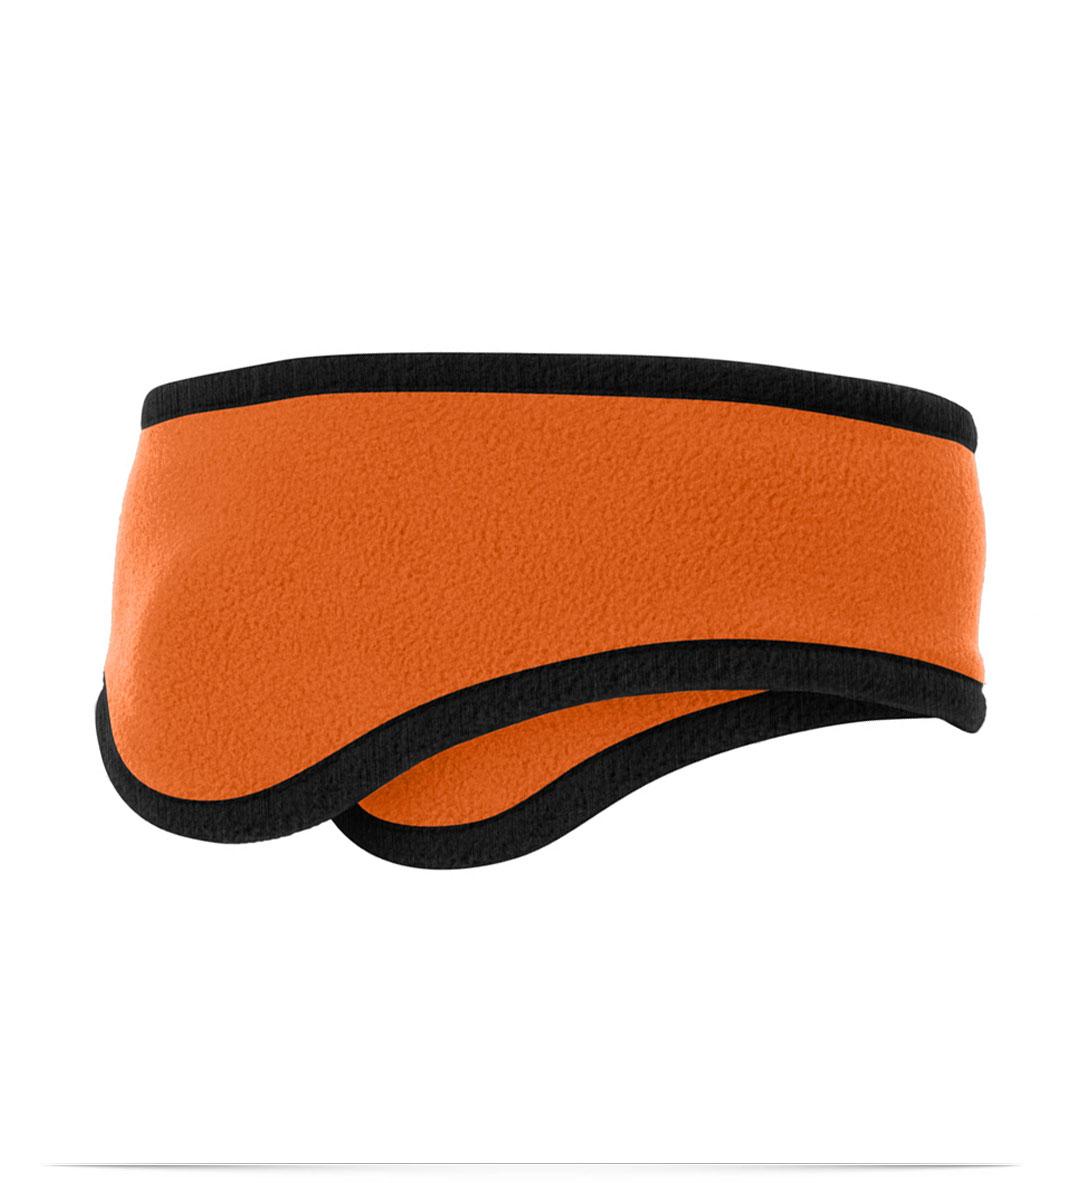 Popular Headbands and Custom Logo Embroidered Fleece Headbands EQ29